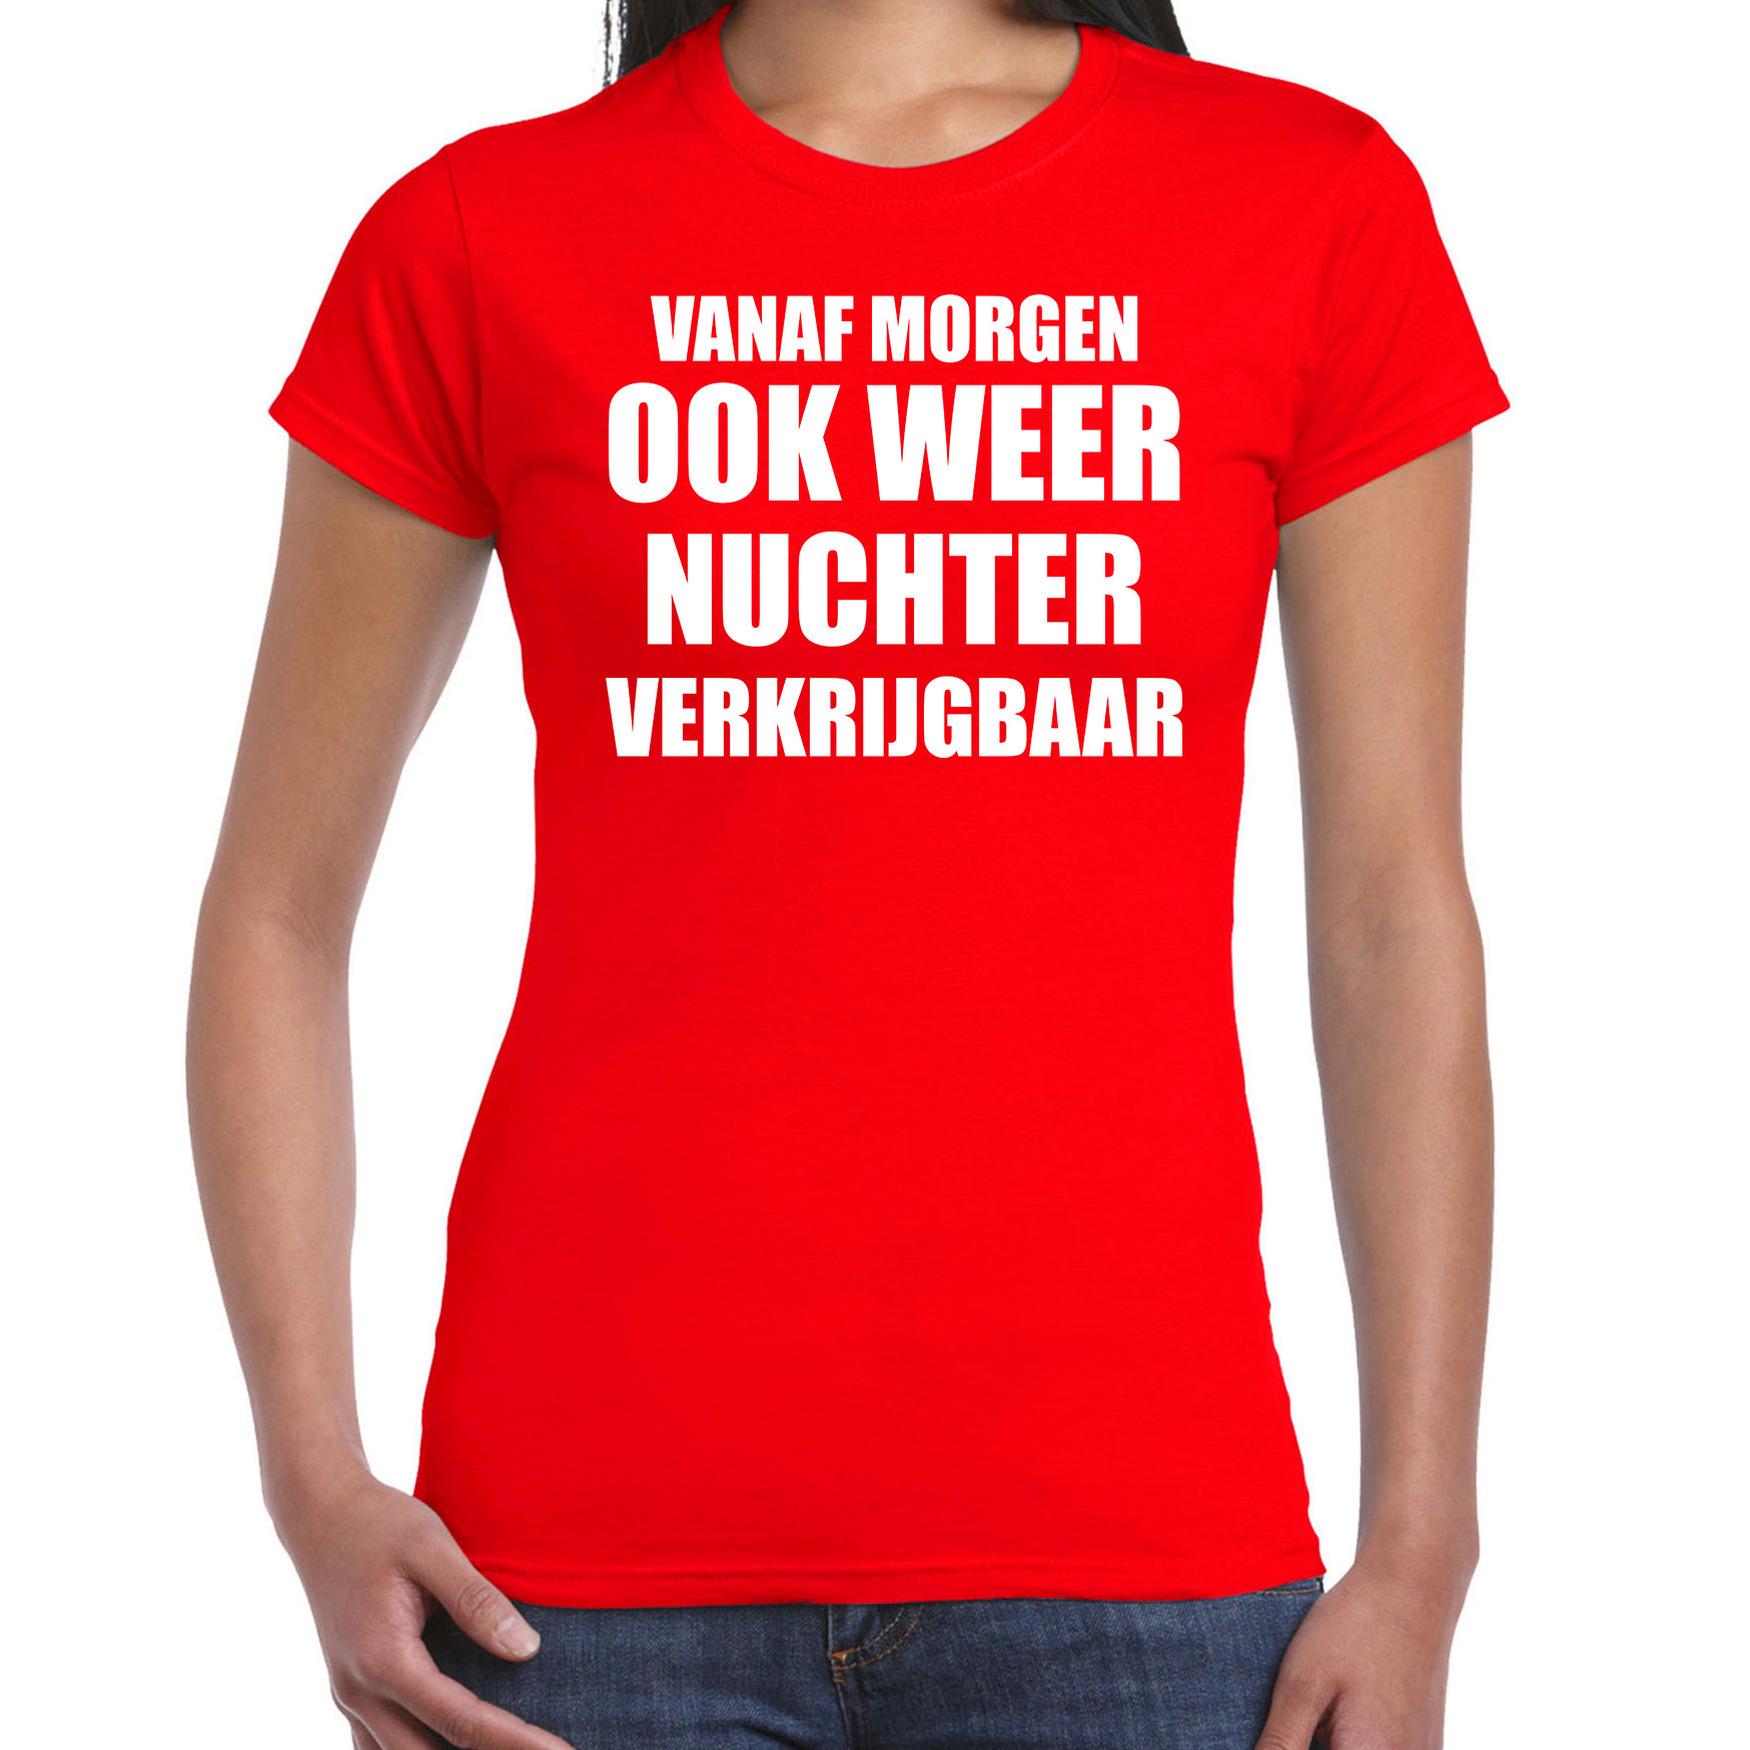 Feest t-shirt morgen nuchter verkrijgbaar rood voor dames XL -